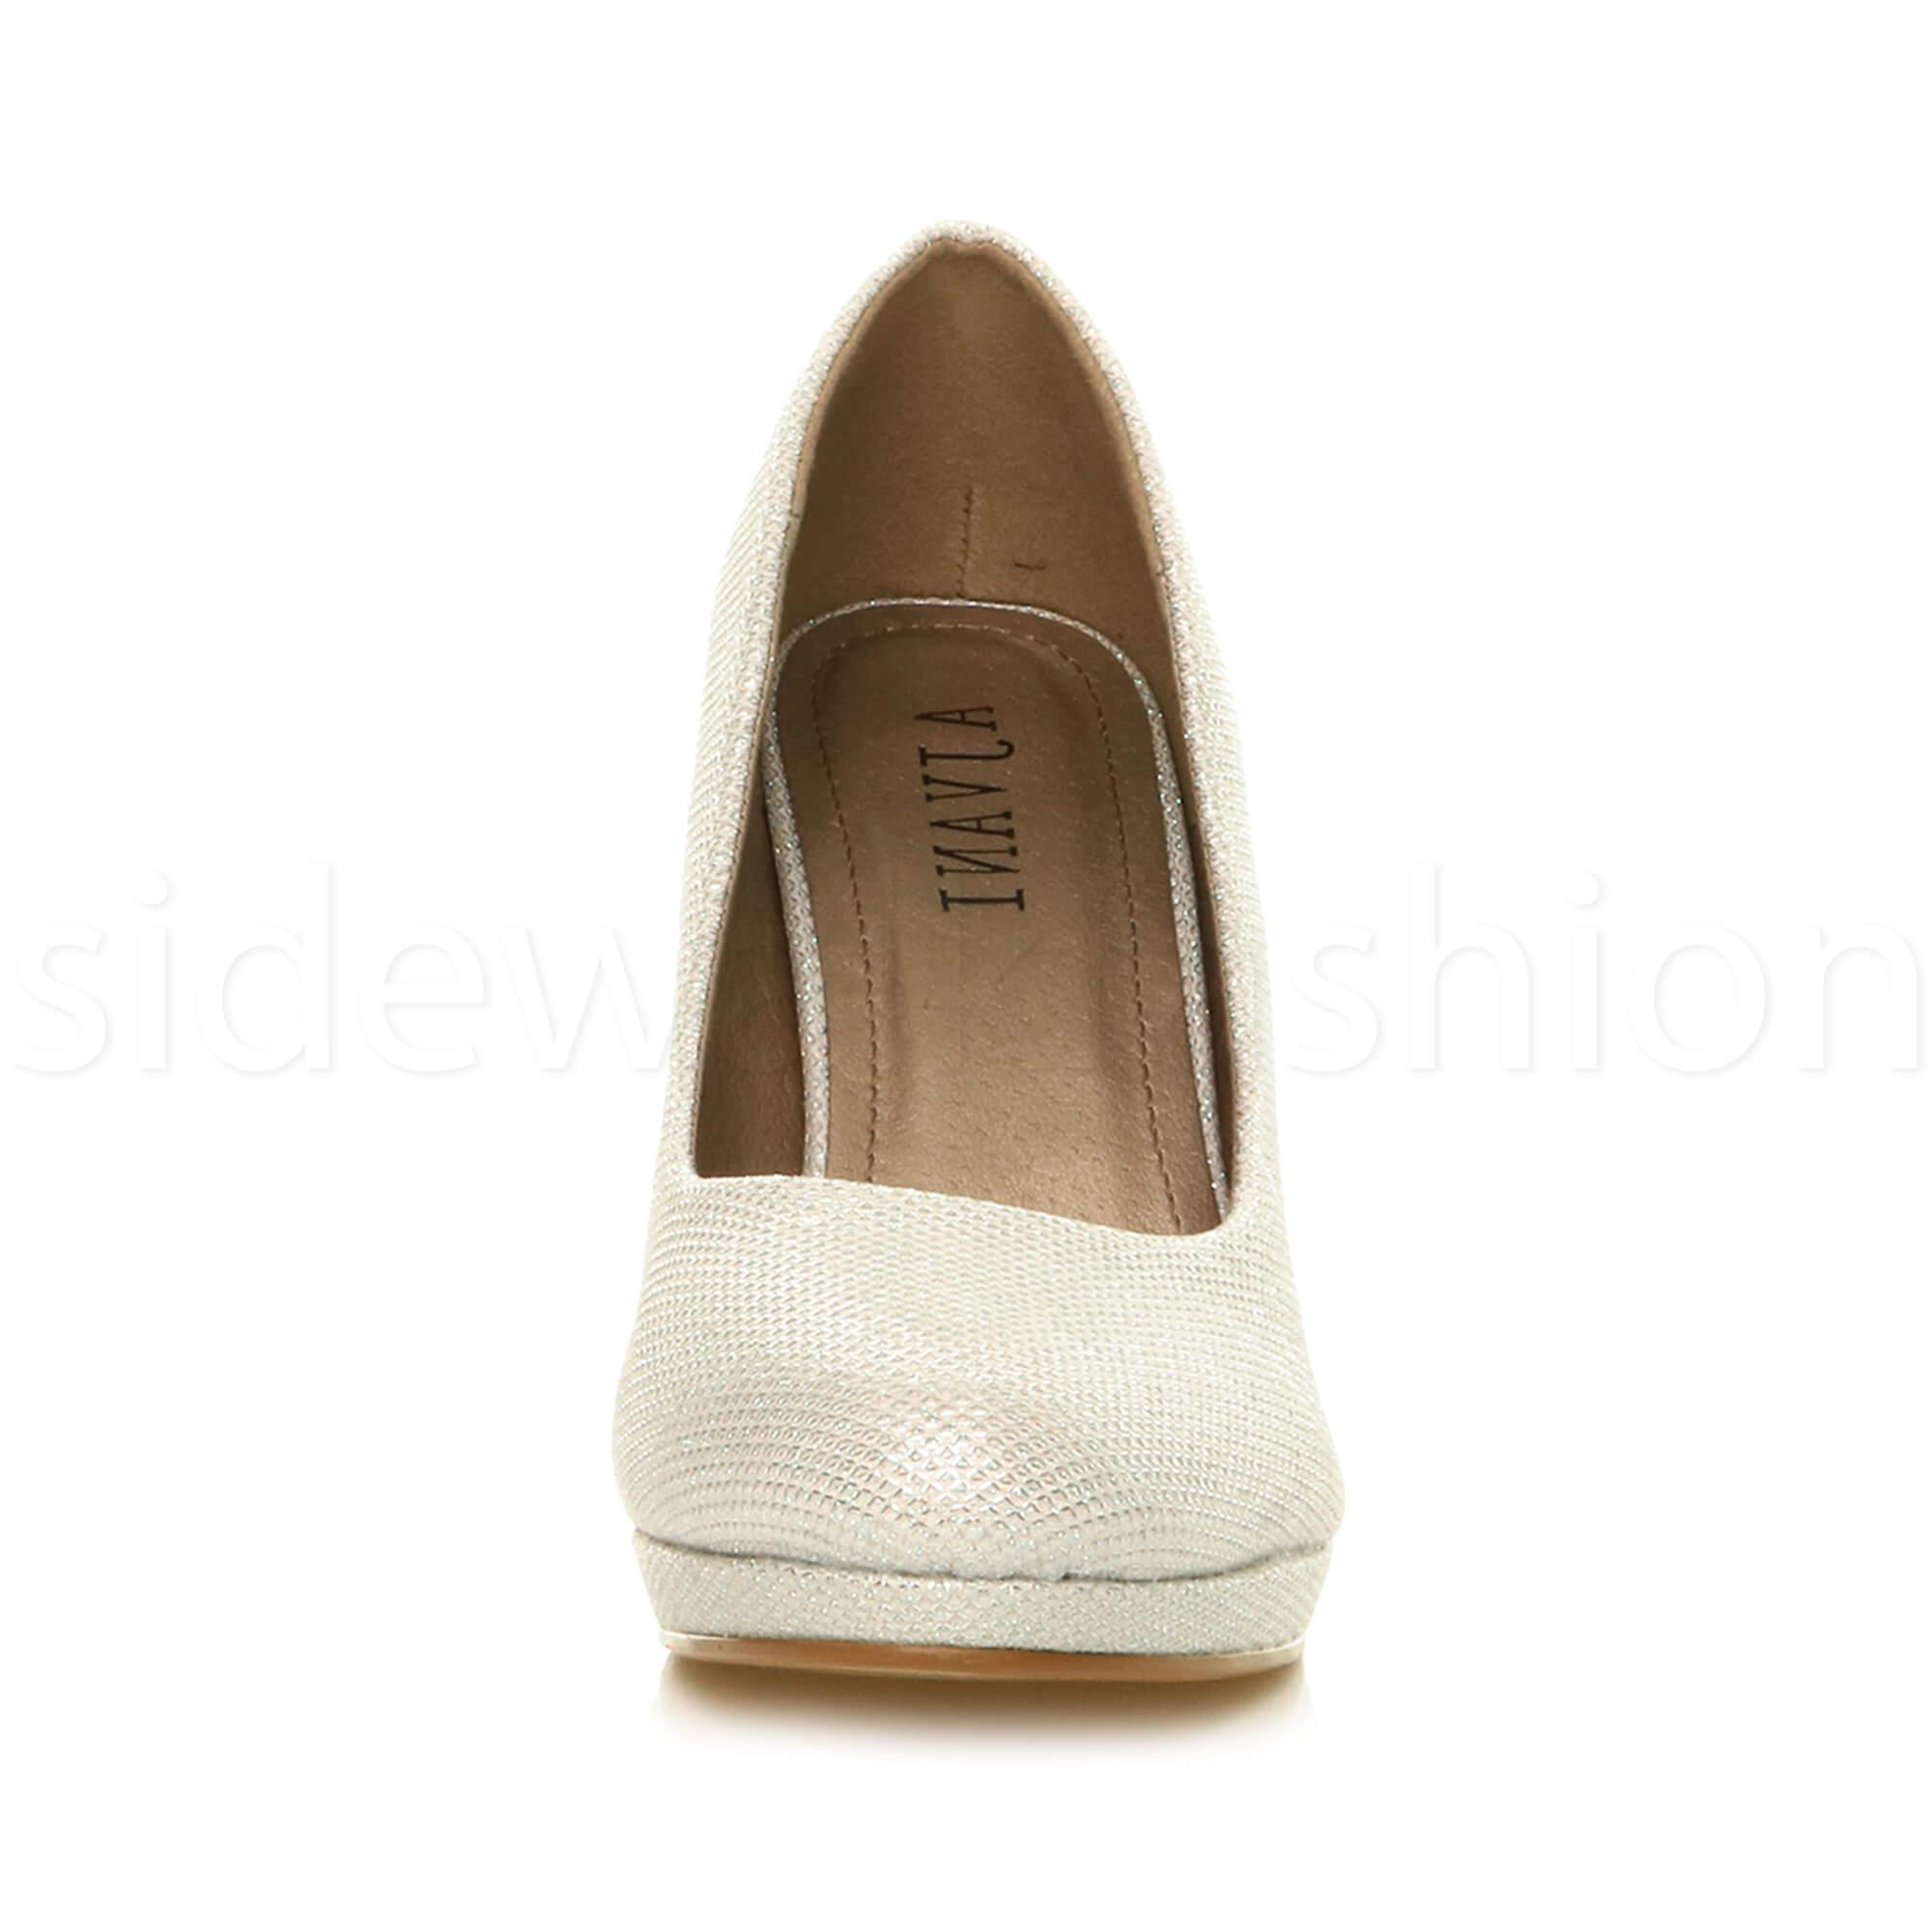 Womens-ladies-high-mid-heel-platform-wedding-evening-bridesmaid-court-shoes-size thumbnail 83